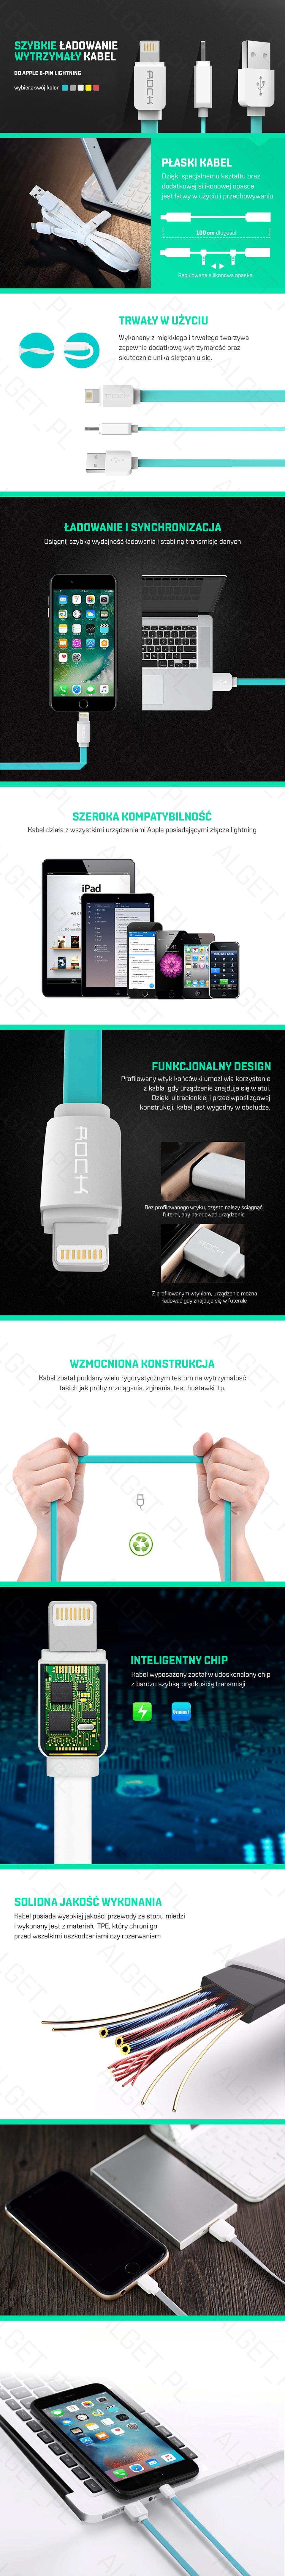 Kabel USB ROCK Ładowarka do iPhone 5 6 7 iPad 2.1A 100cm